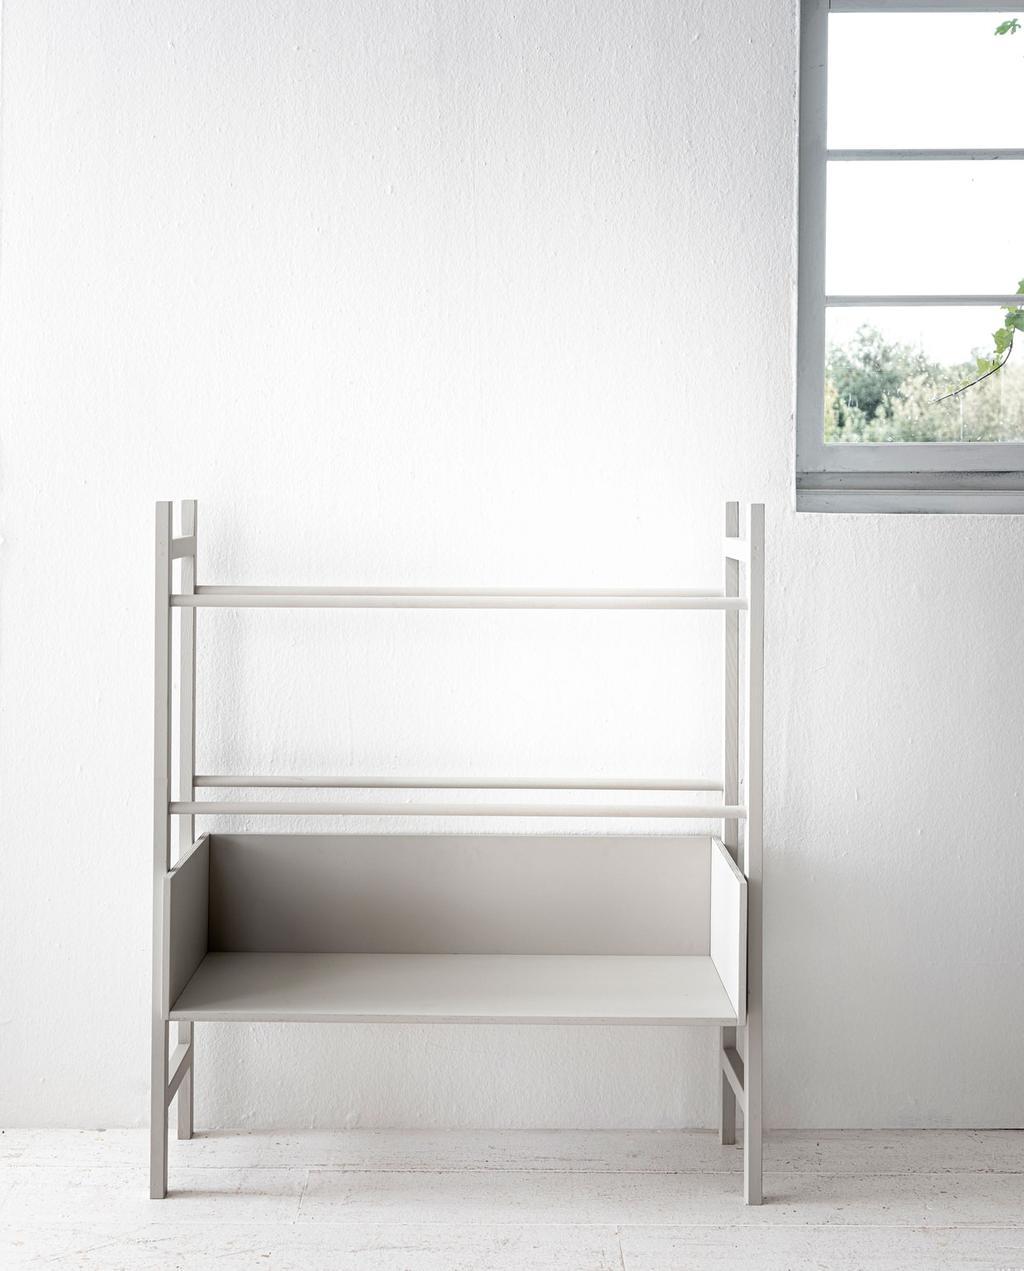 vtwonen 12-2019 | DIY flexibel kastje stap 2